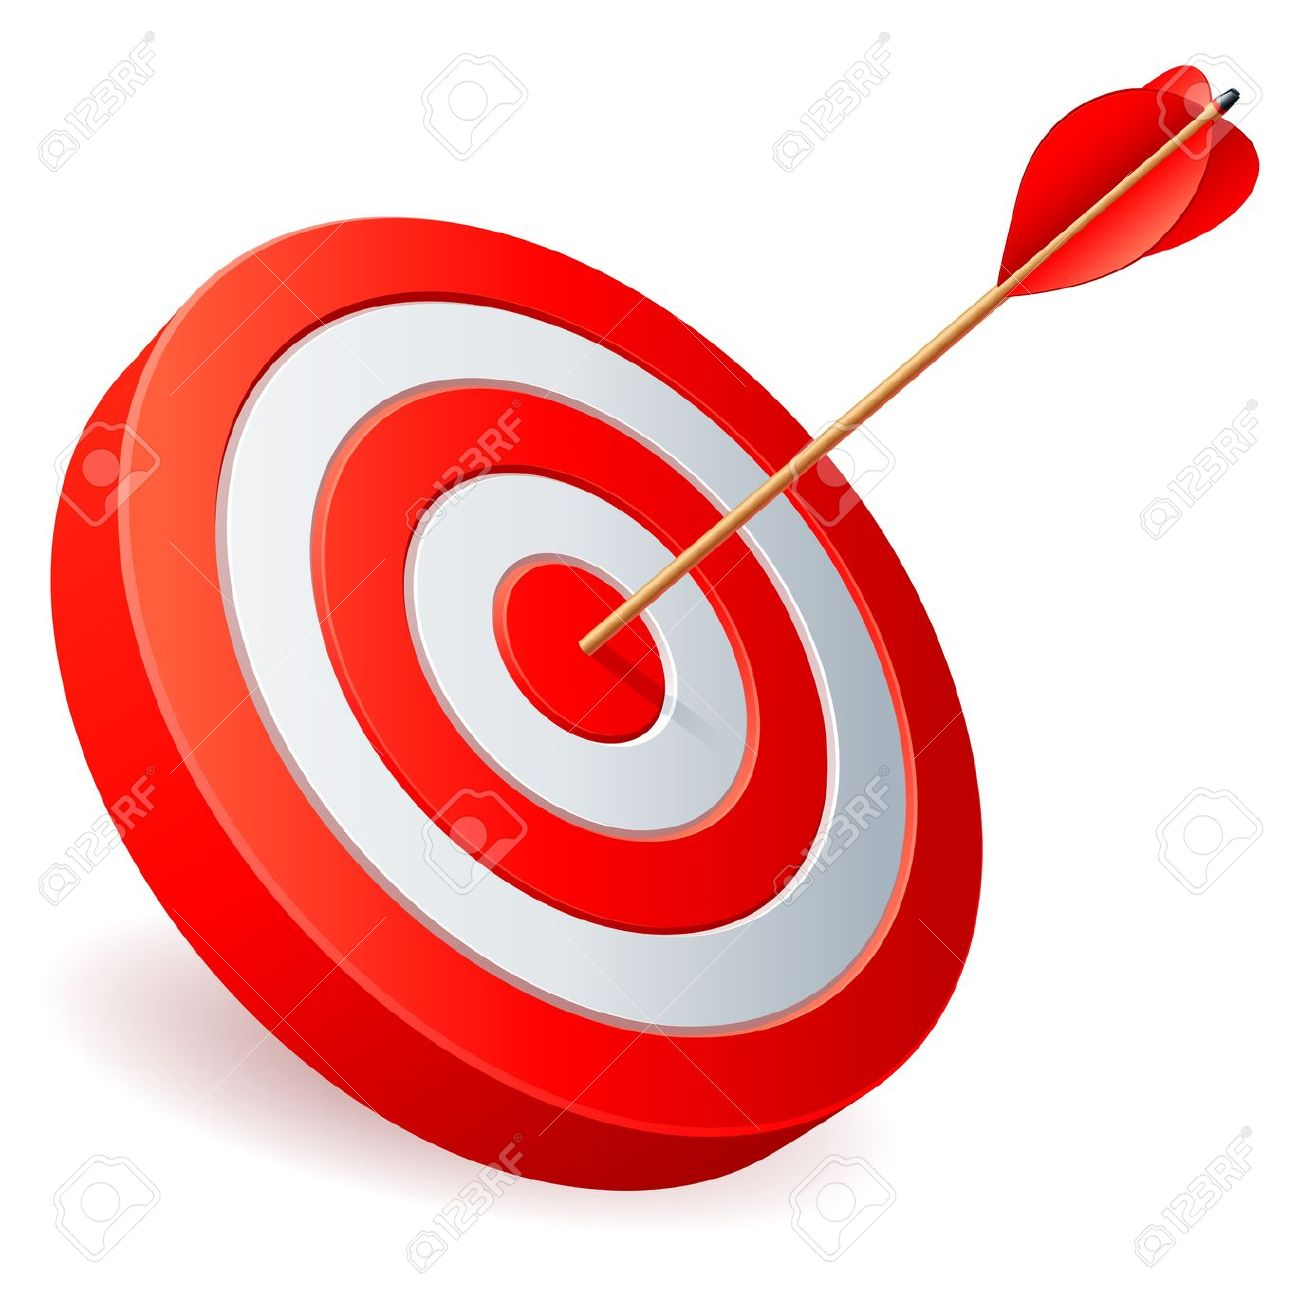 target clipart-target clipart-15